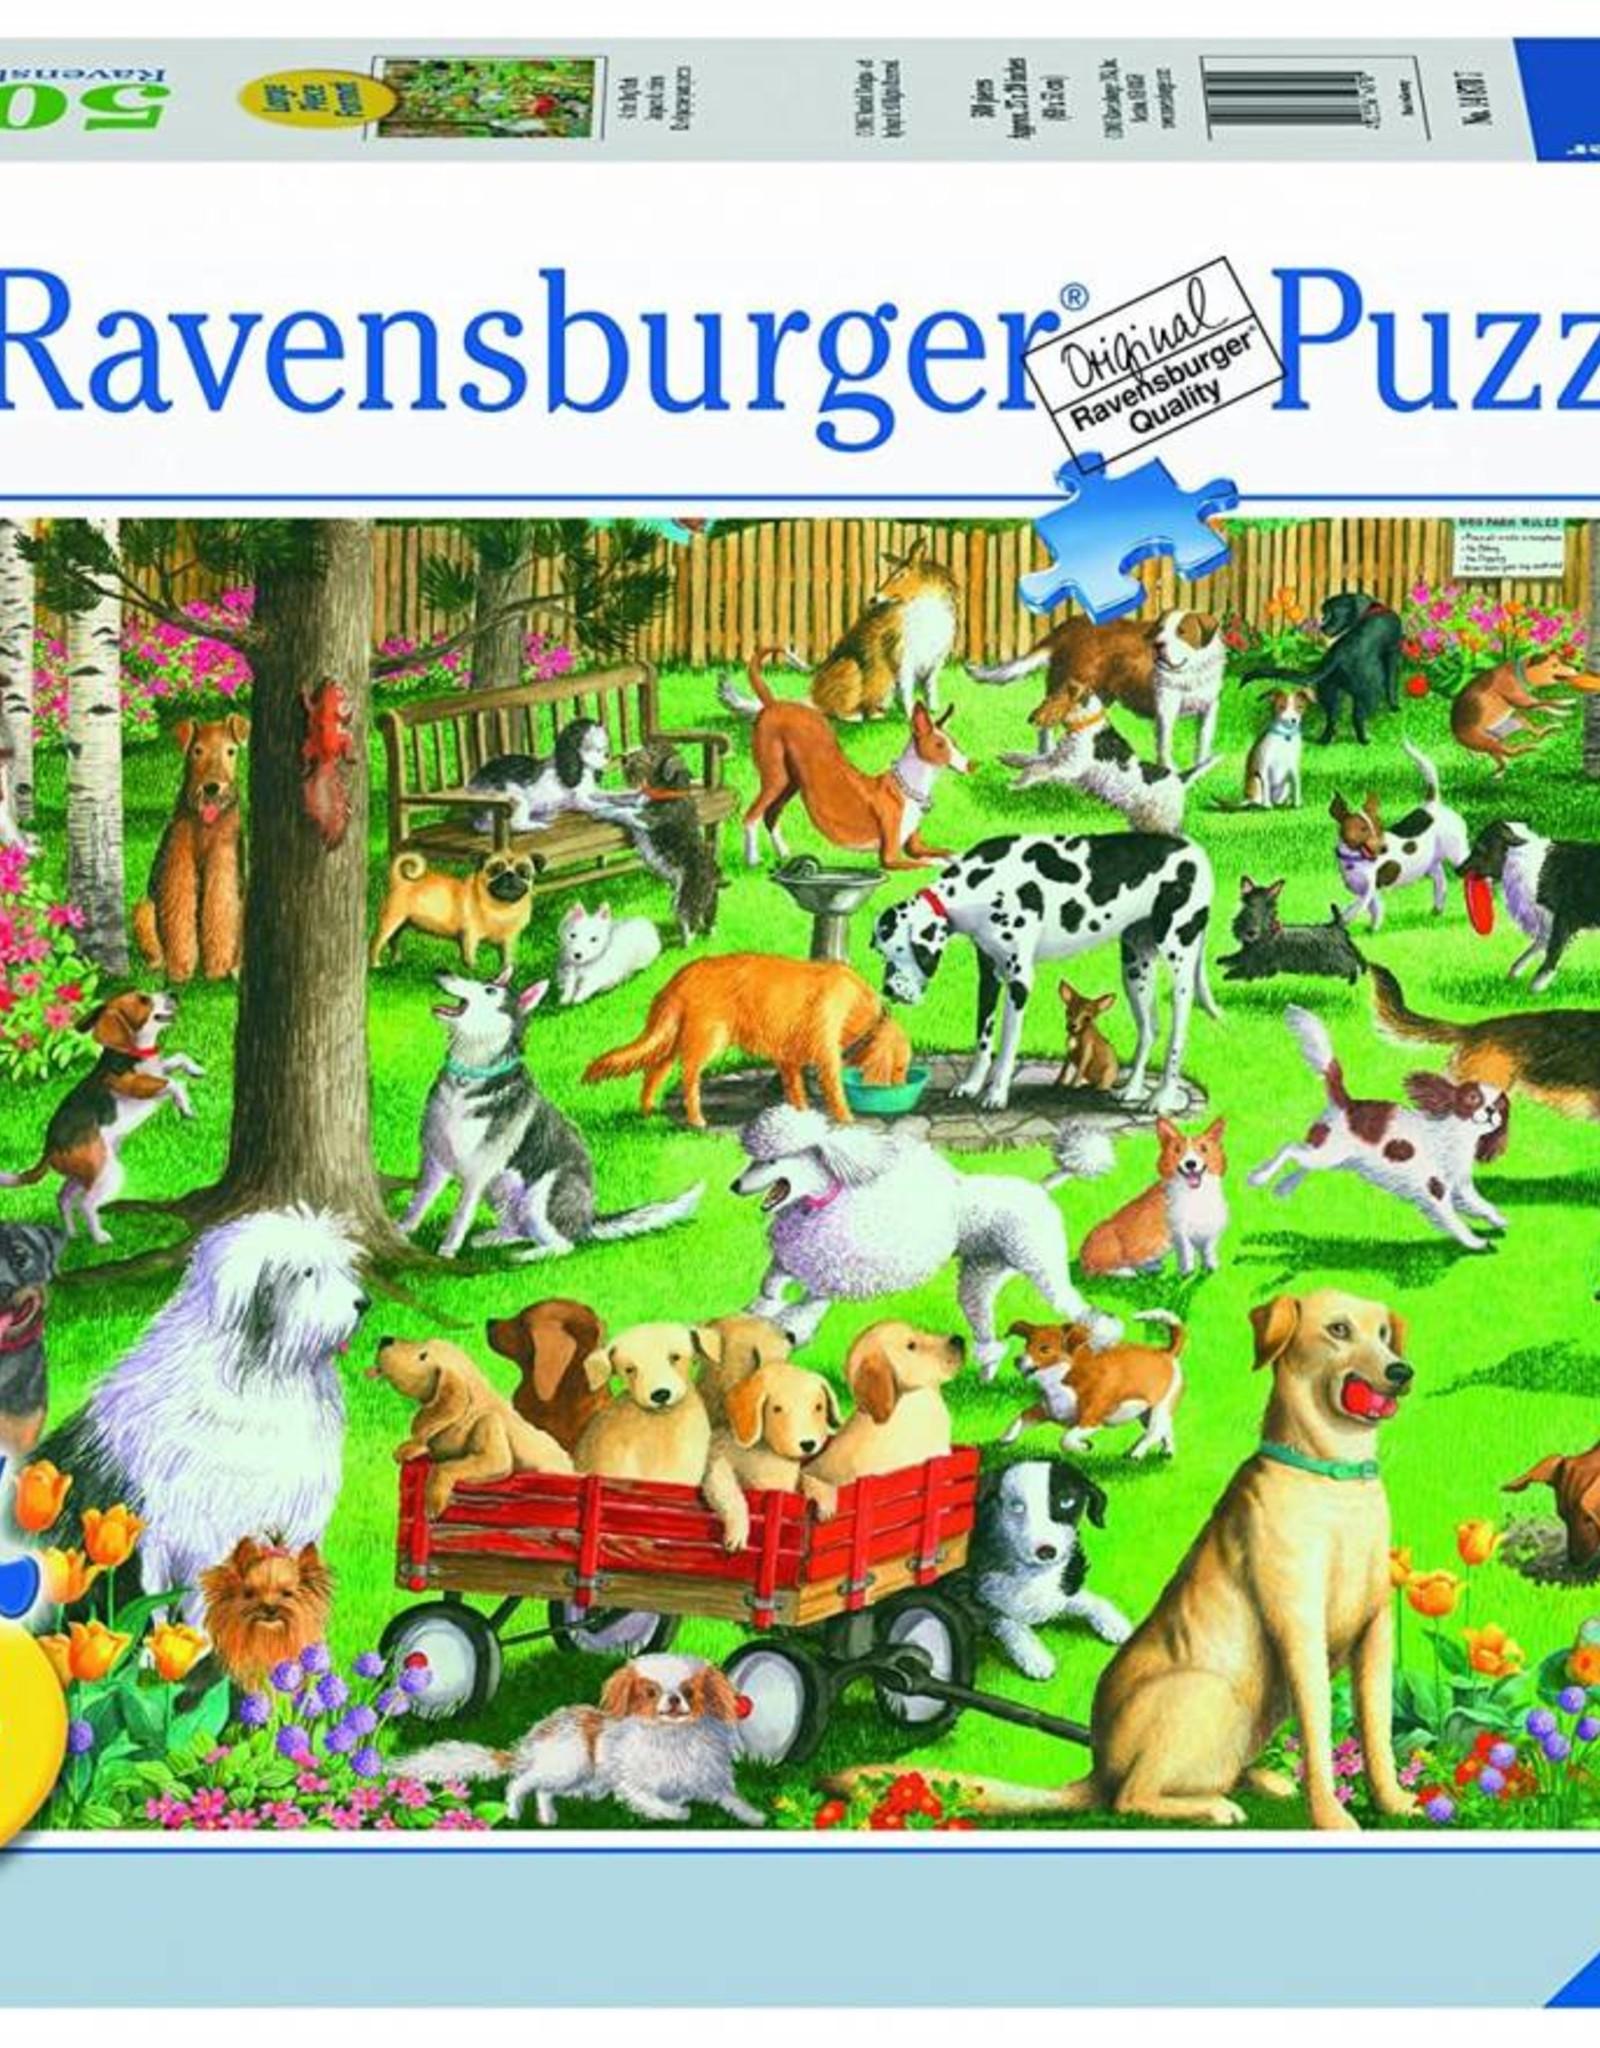 Ravensburger At the Dog Park 500pc Puzzle Large Format